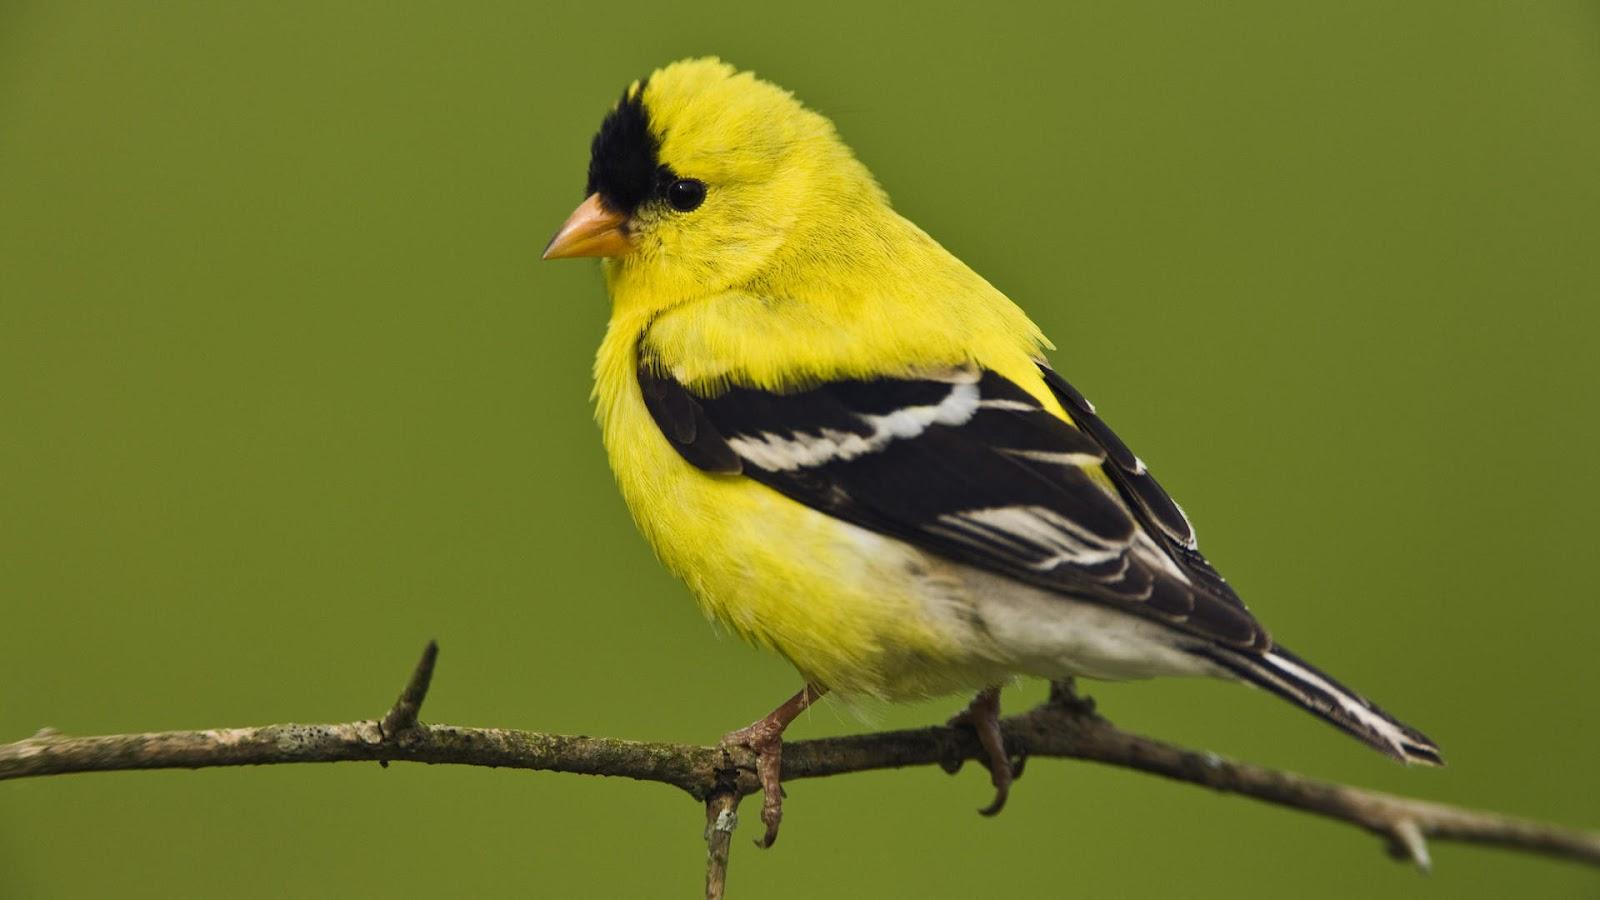 Yellow Bird Pictures